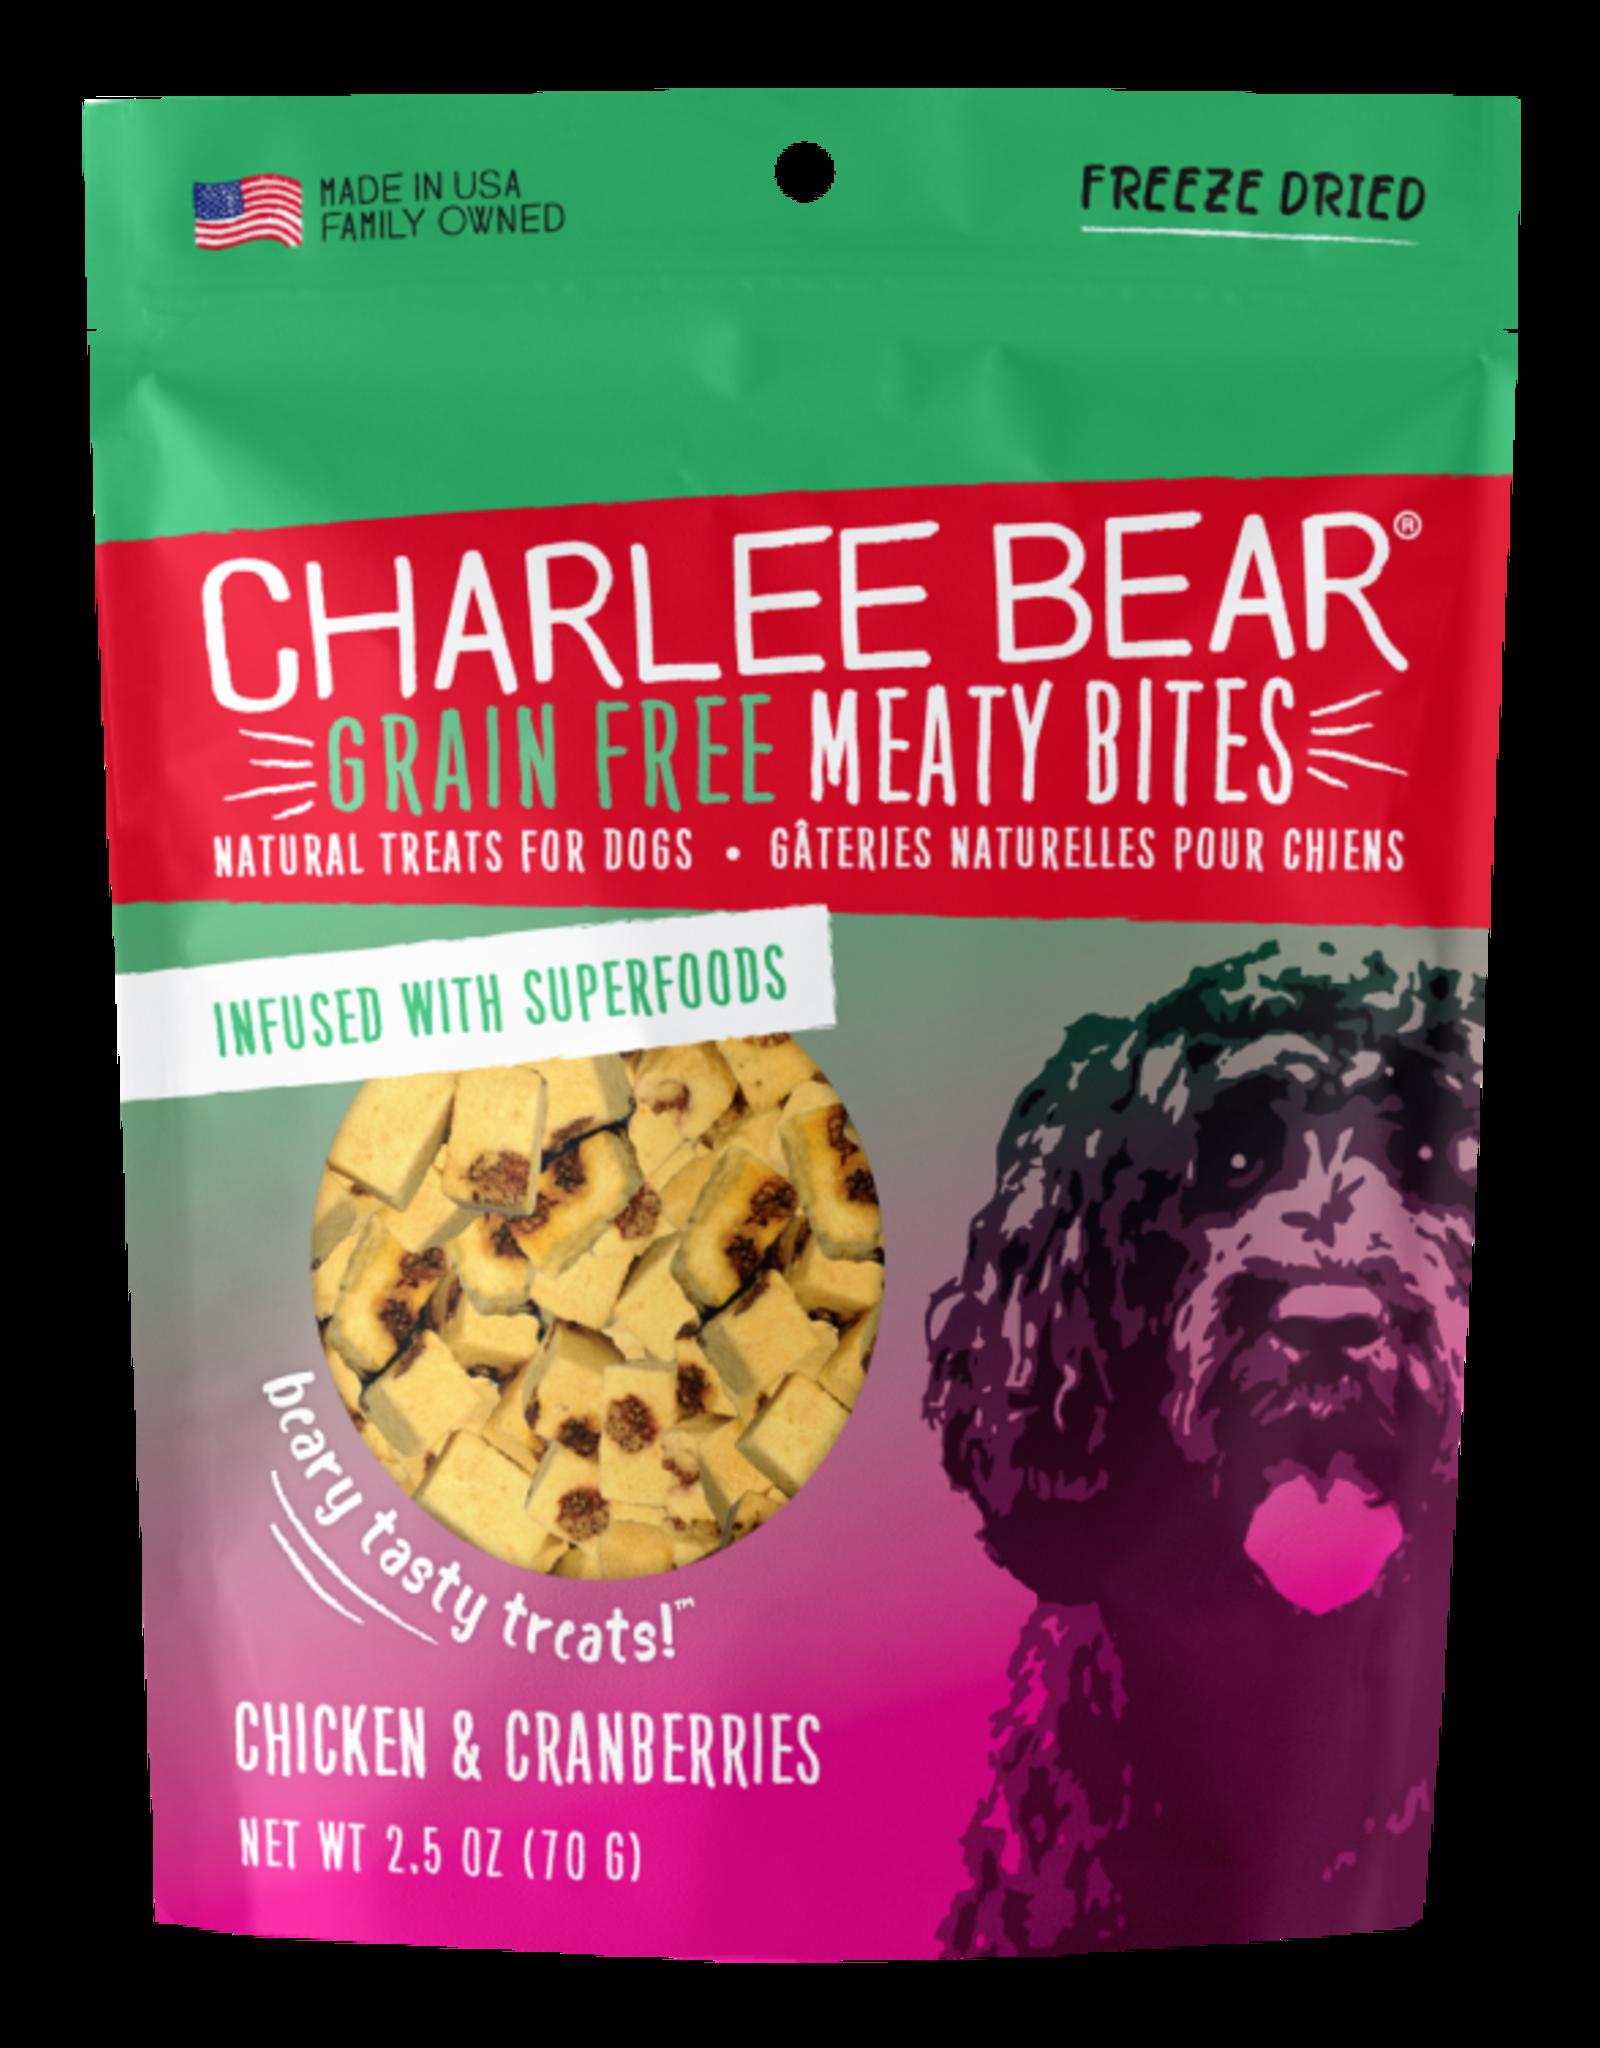 Charlee Bear Meaty Bites Chicken & Cranberries